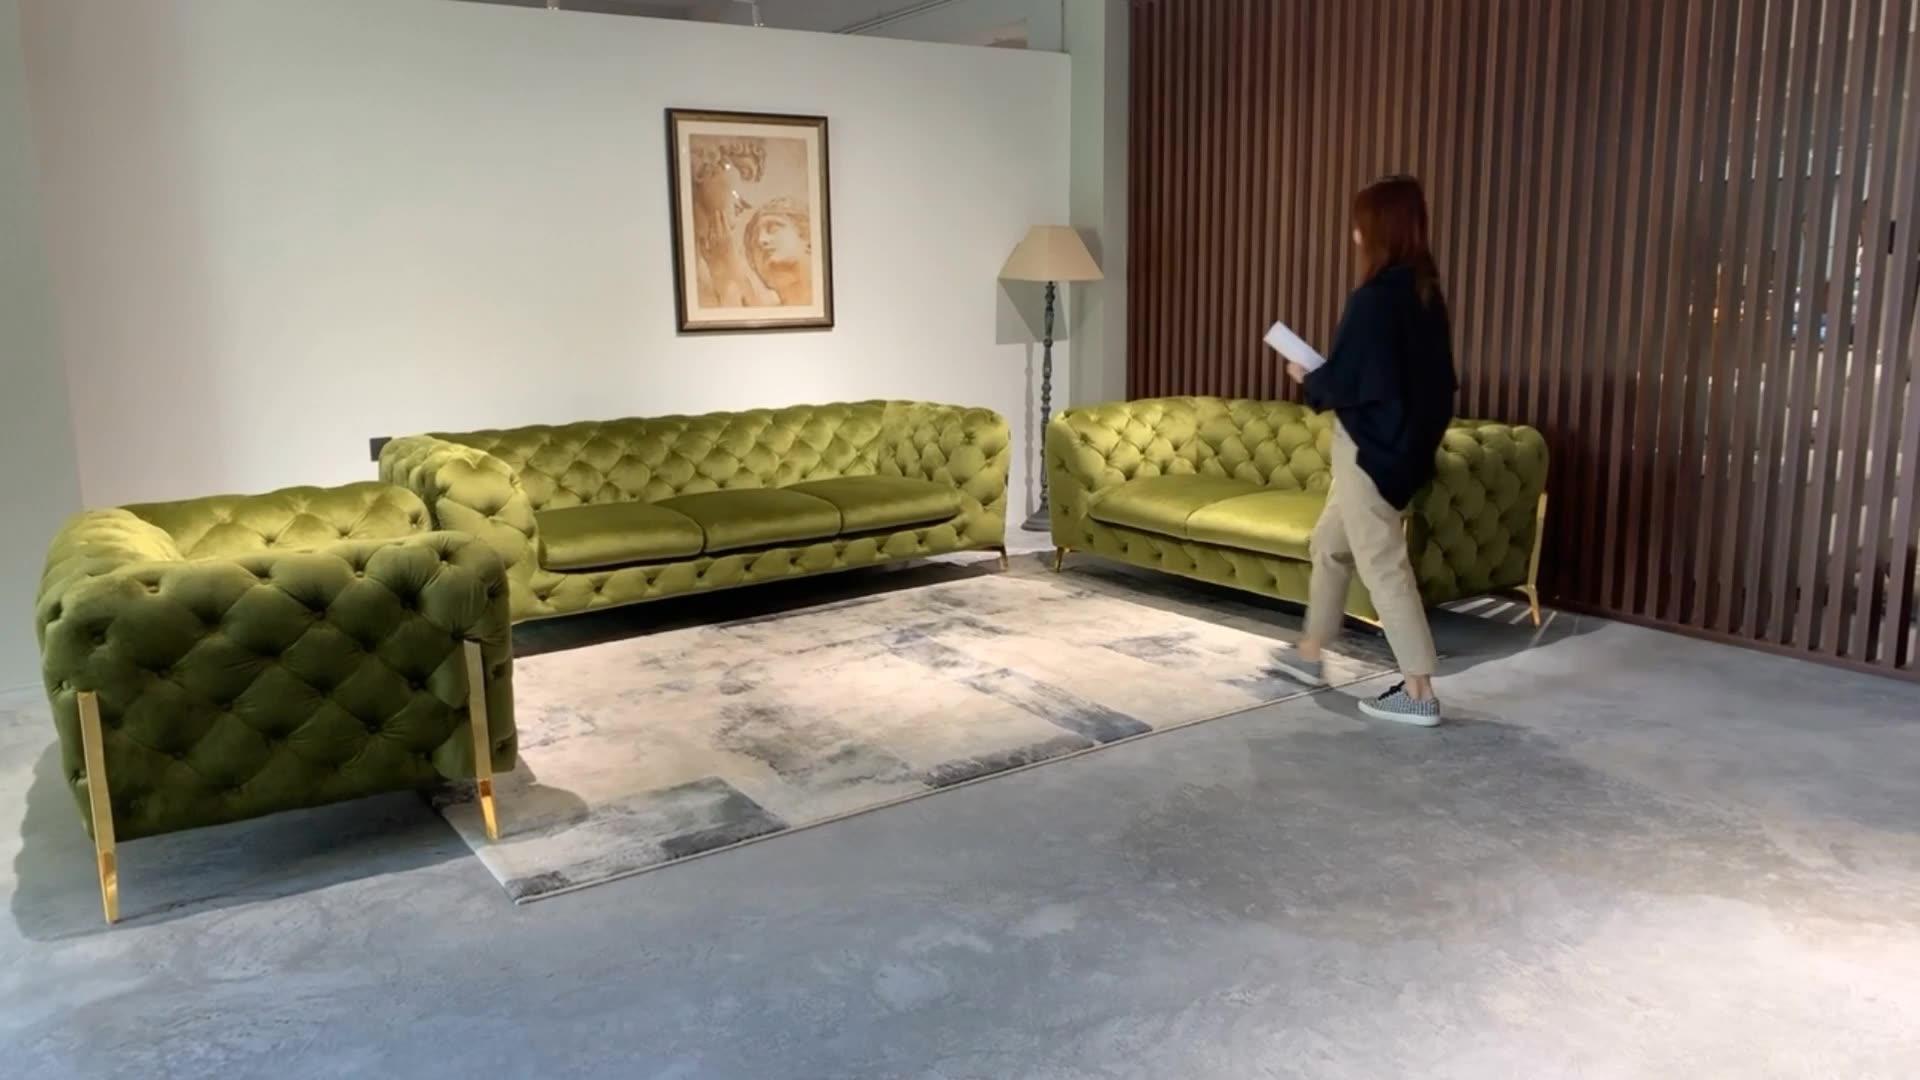 321 Chesterfield designs modern italian sofa set living room furniture